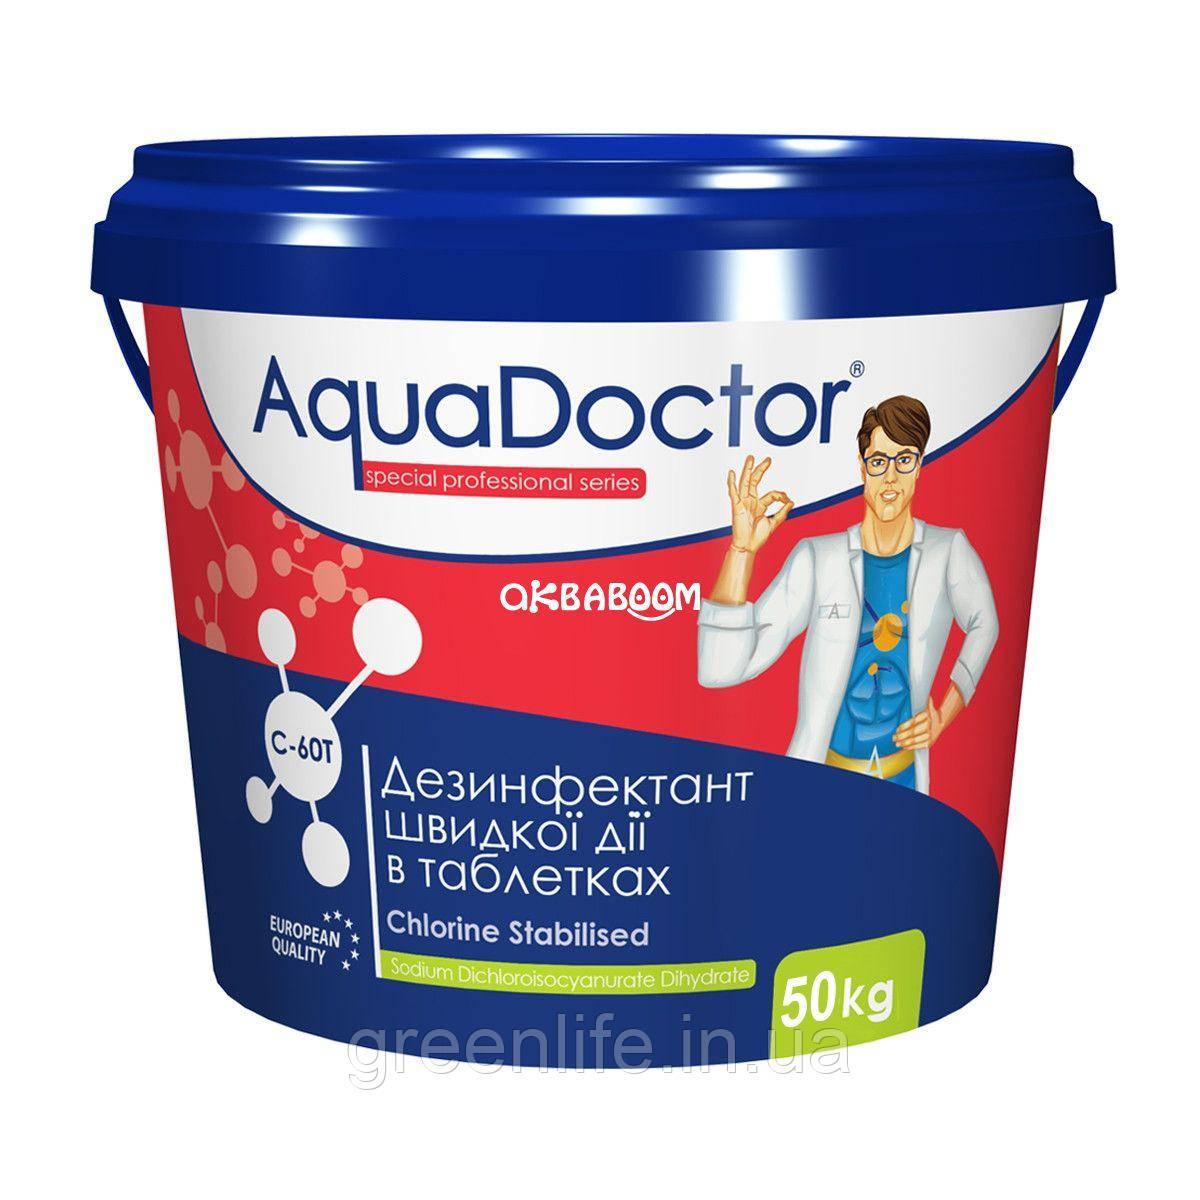 Шоковий хлор в таблетках Aquadoctor С60Т (50 кг) Аквадоктор, в таблетках, 50 кг